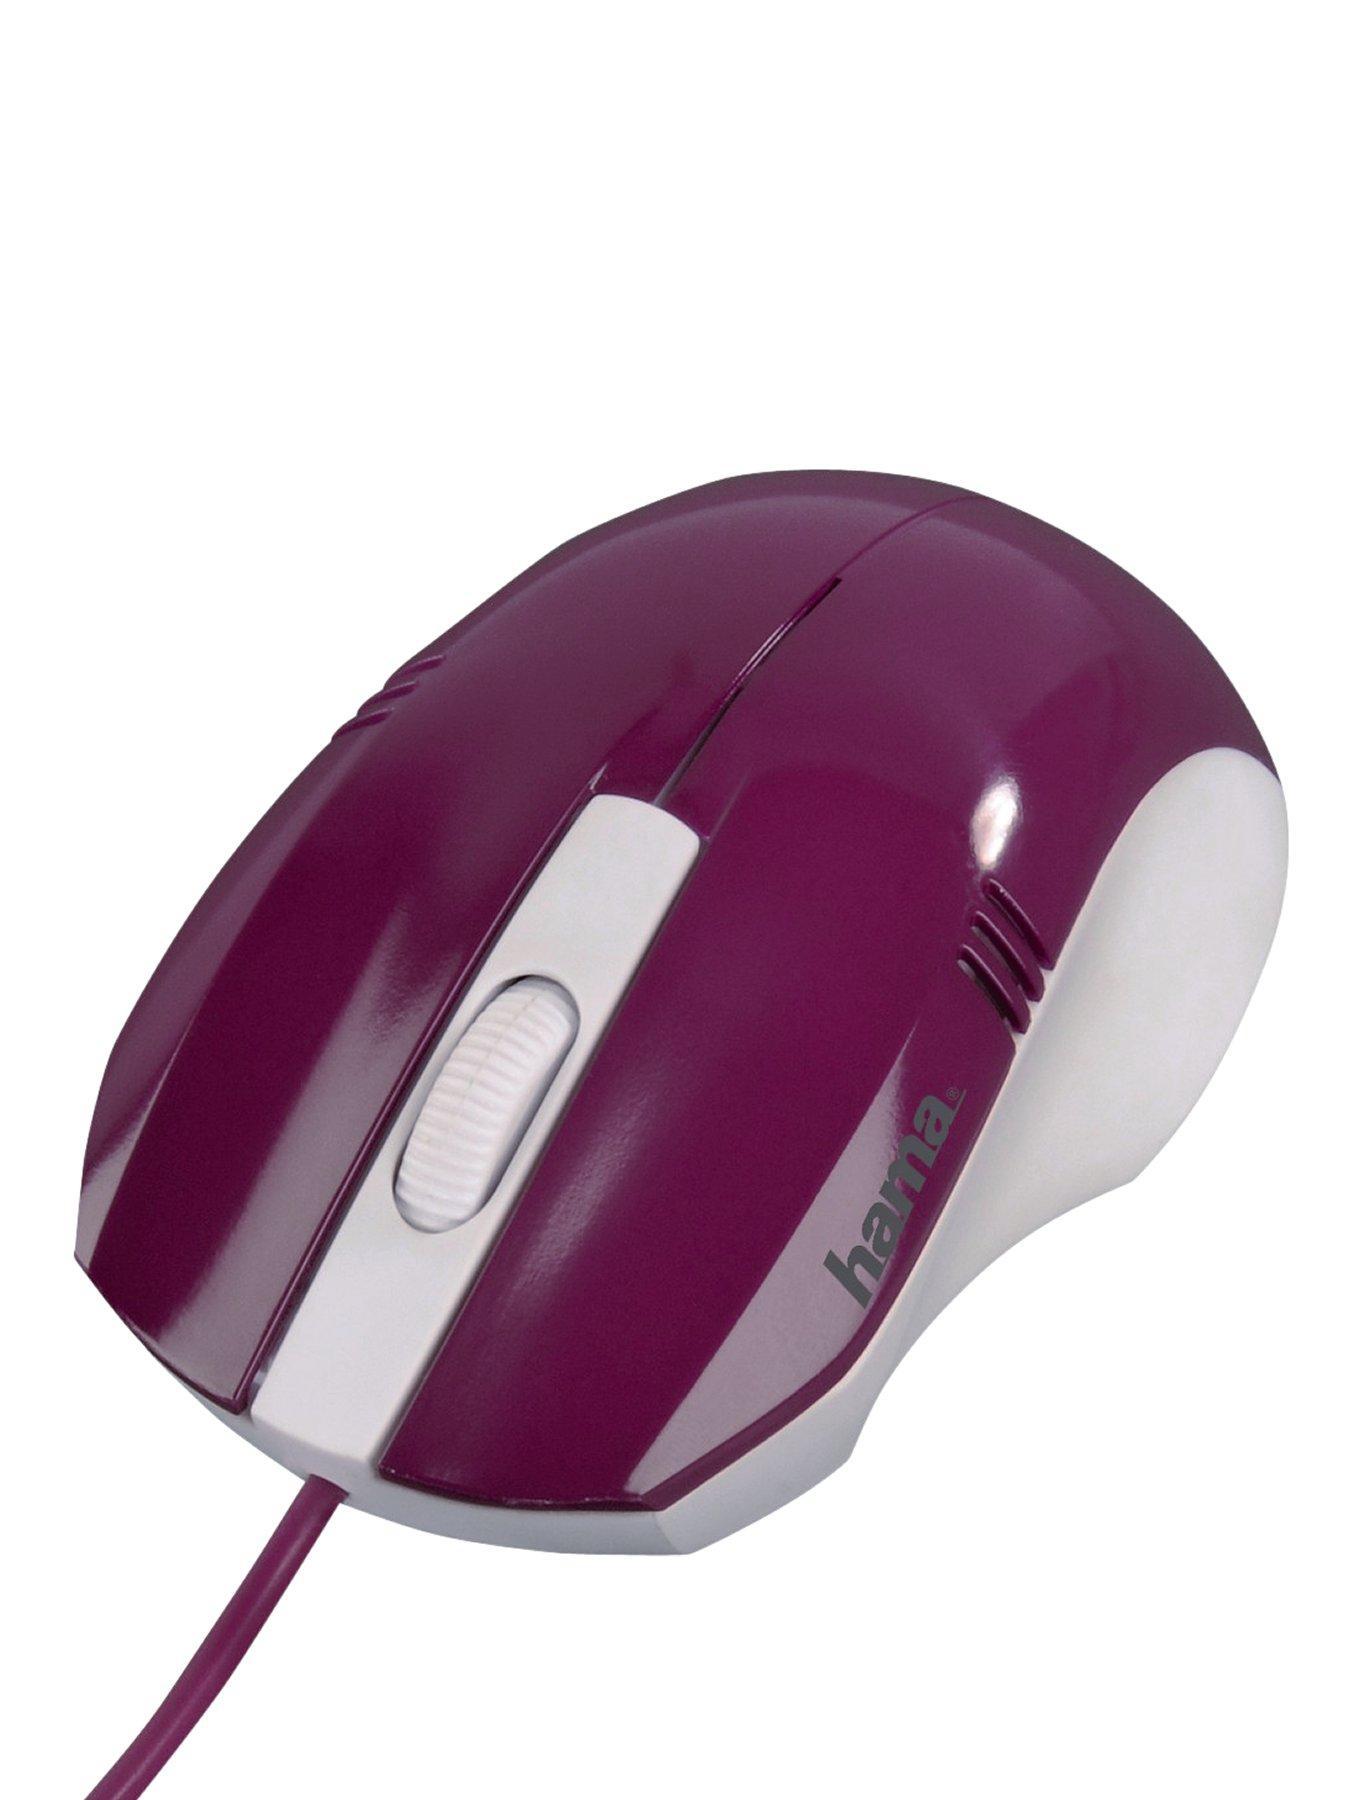 HAMA Dispersion Mouse - Purple